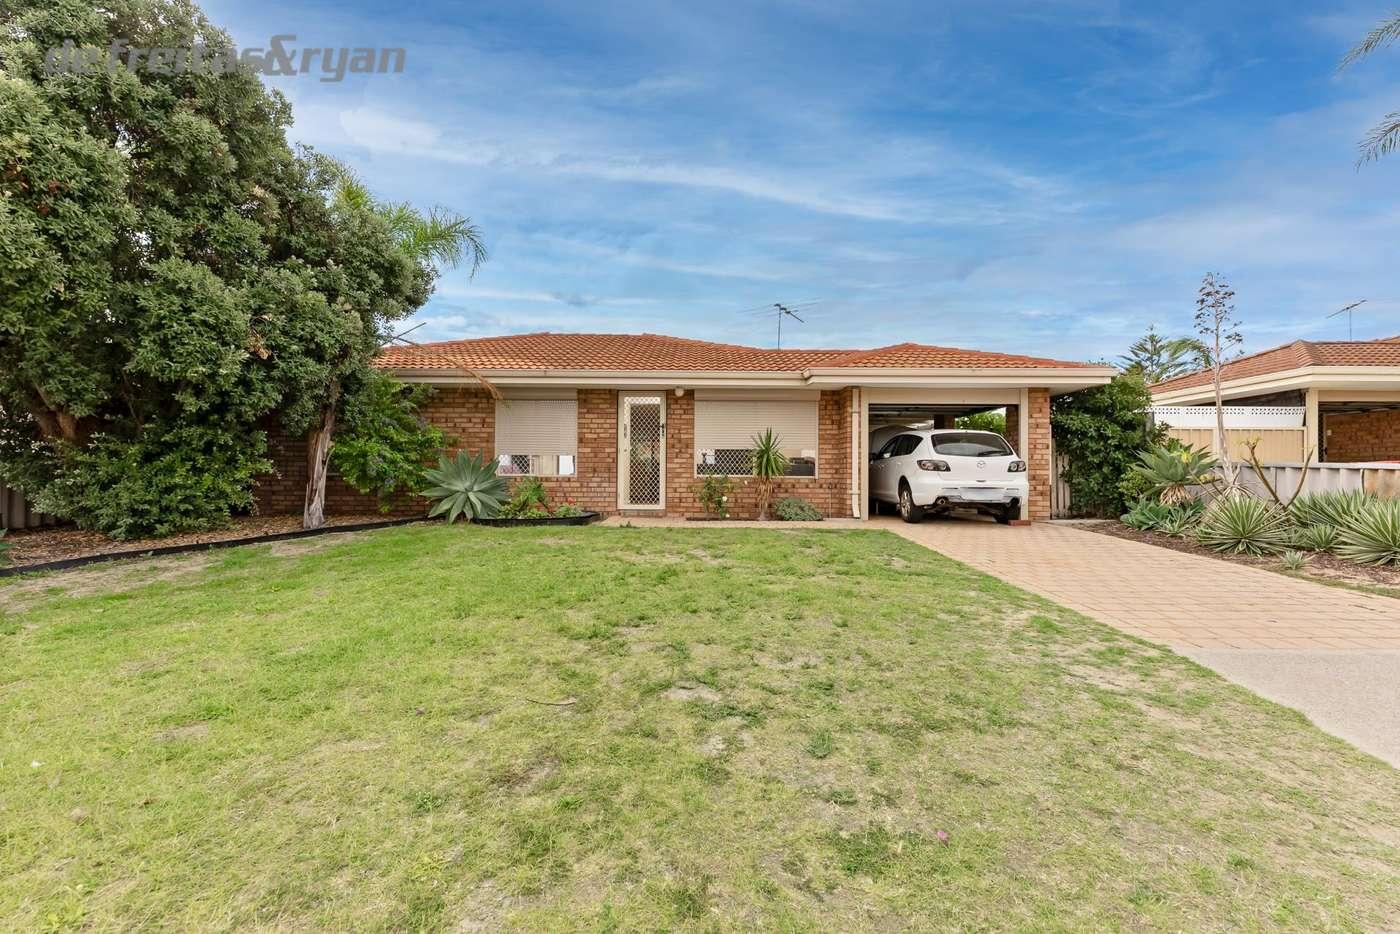 Main view of Homely house listing, 5 Orania Mews, Warnbro WA 6169